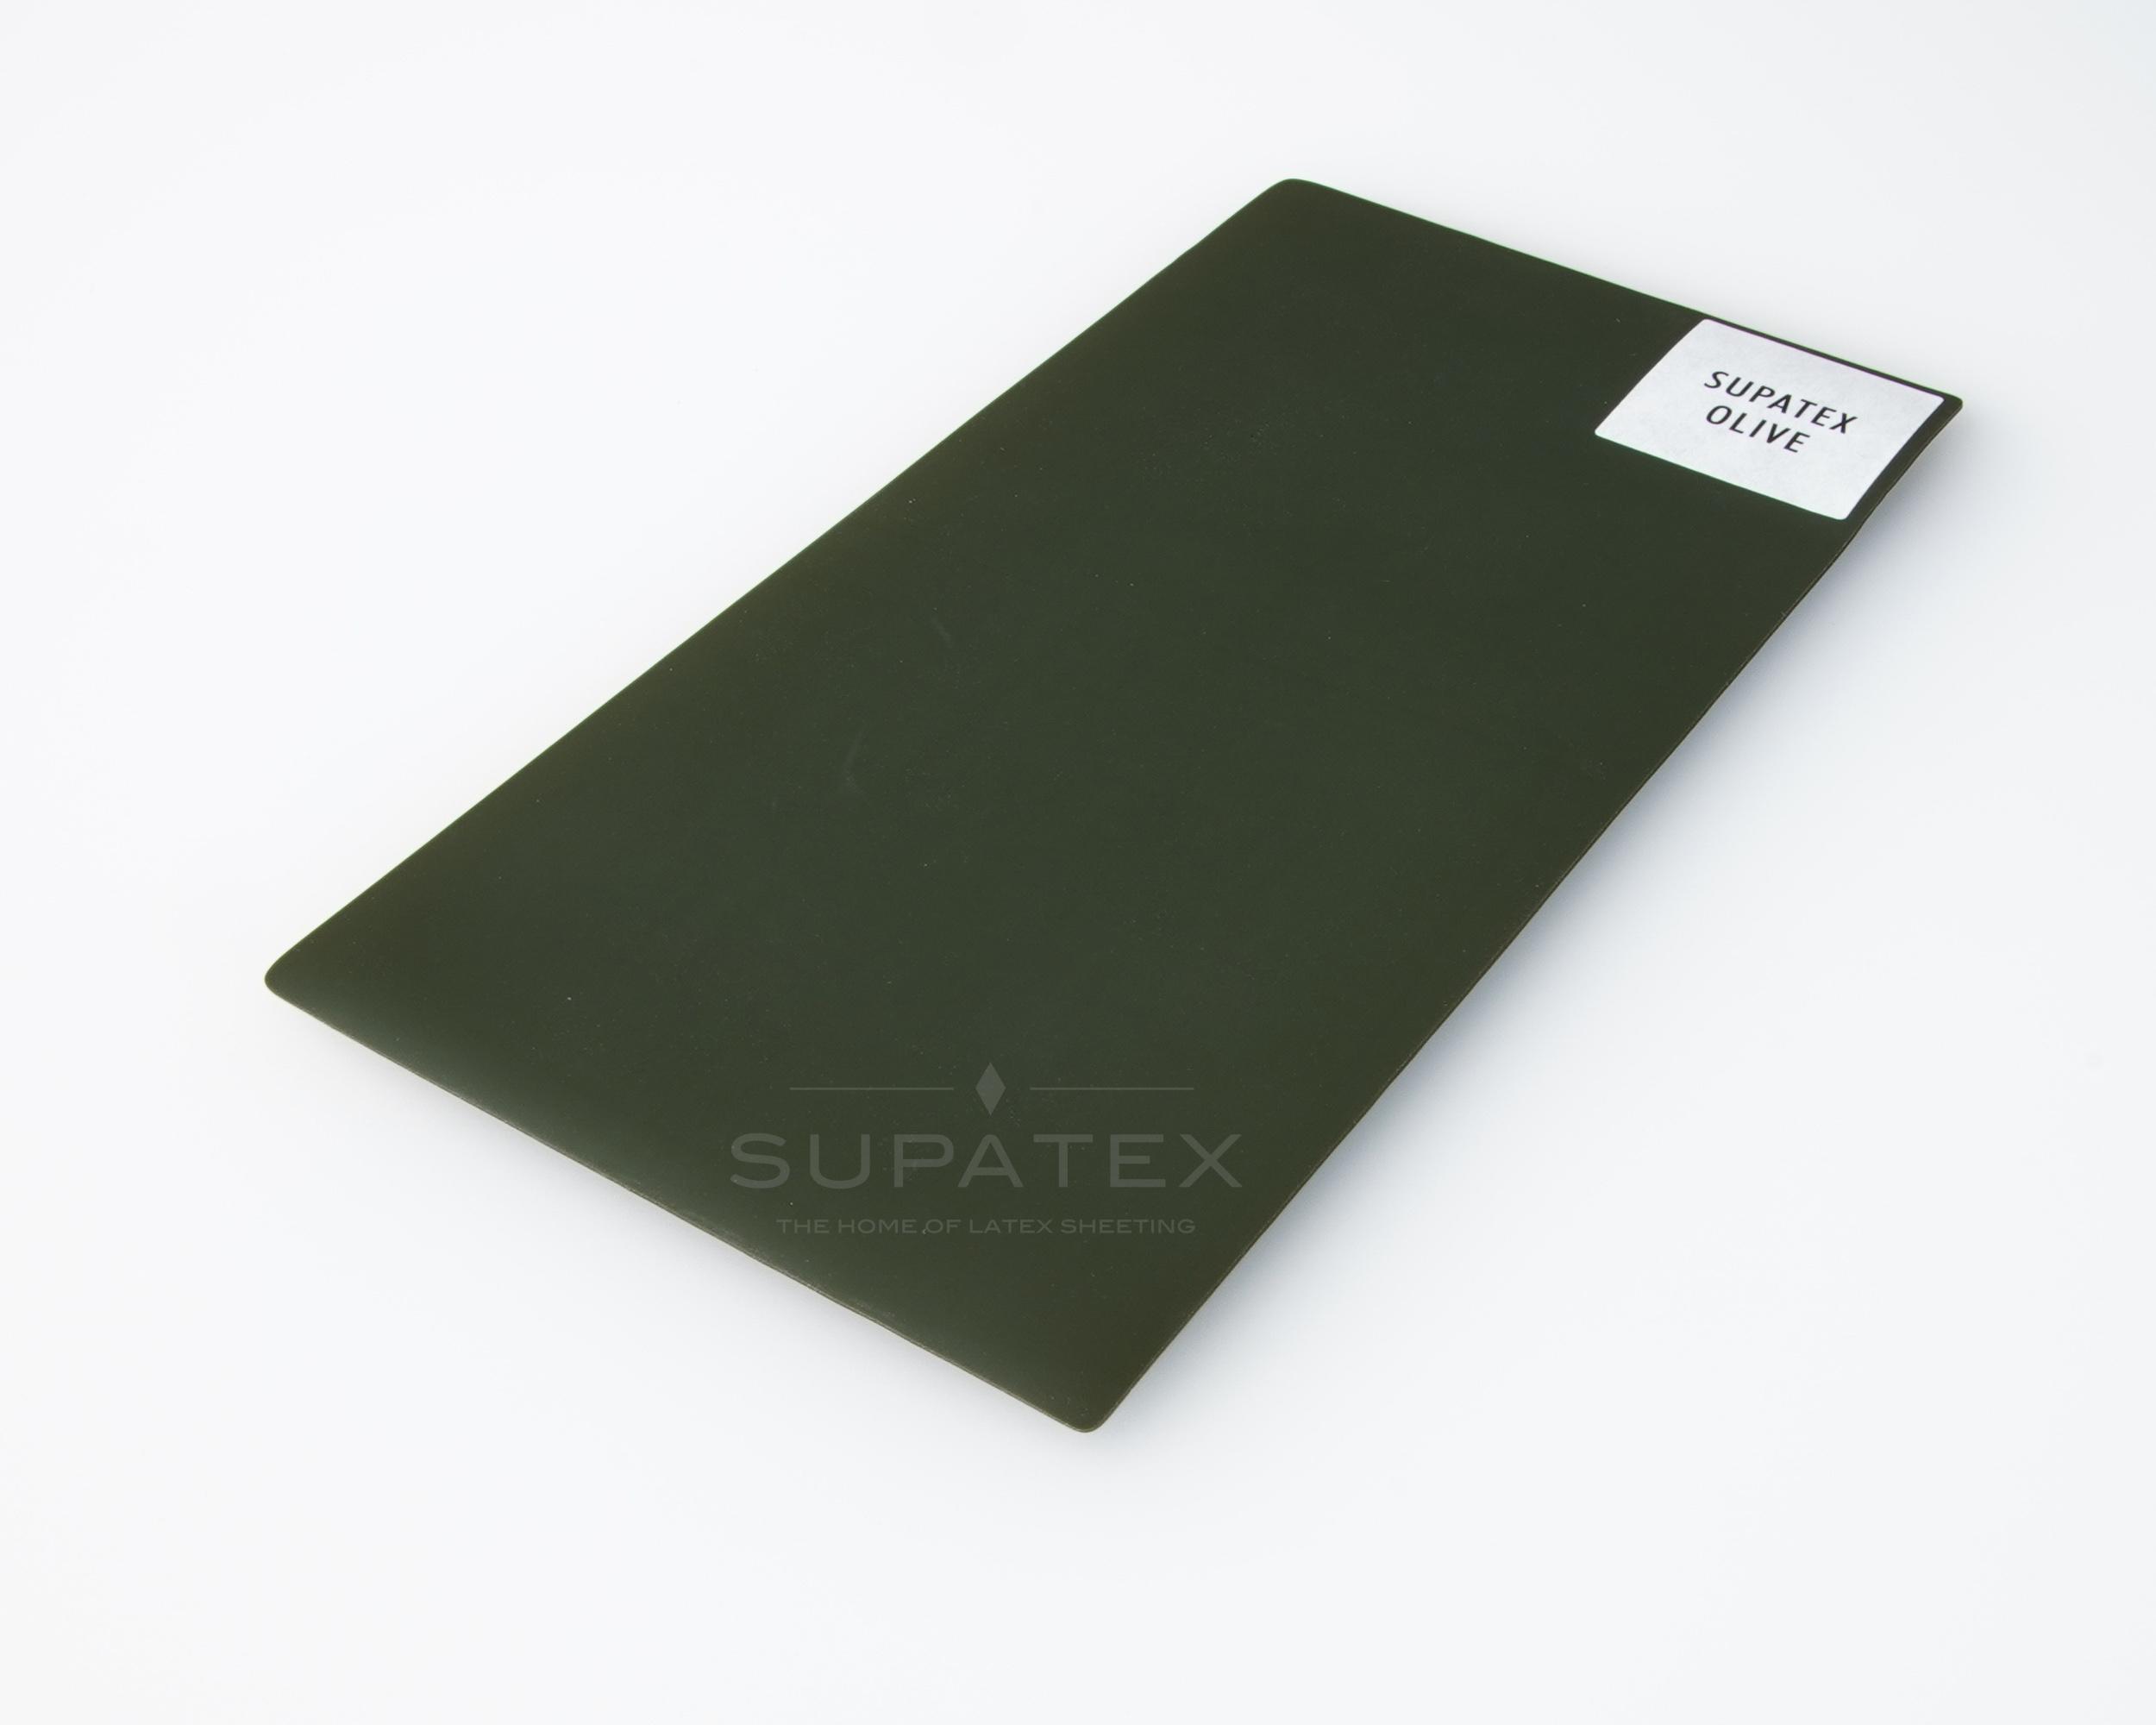 Supatex Olive 0.33 mm